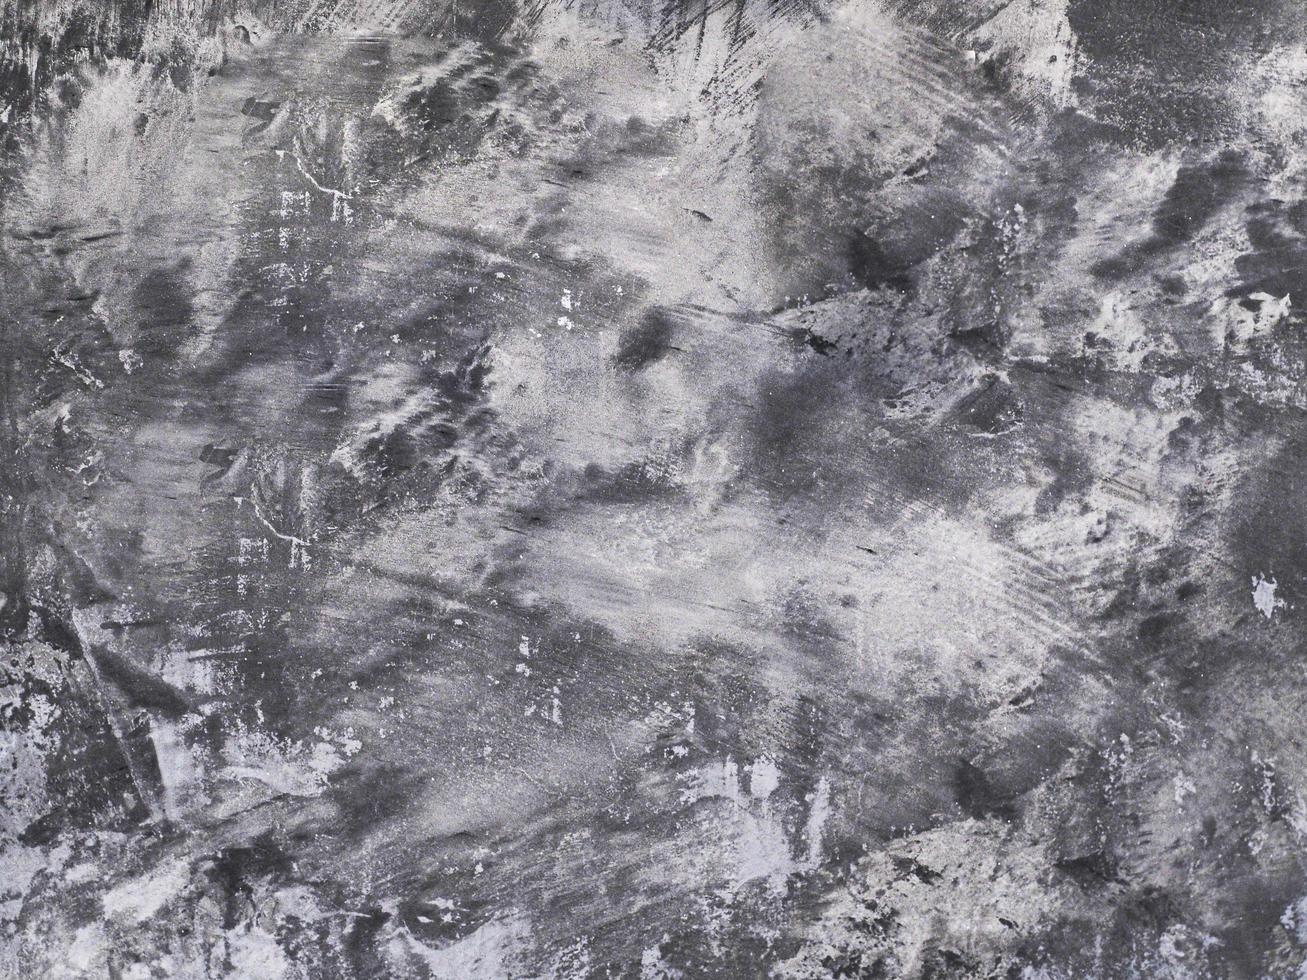 oude grunge cement polish textuur constructie achtergrond foto